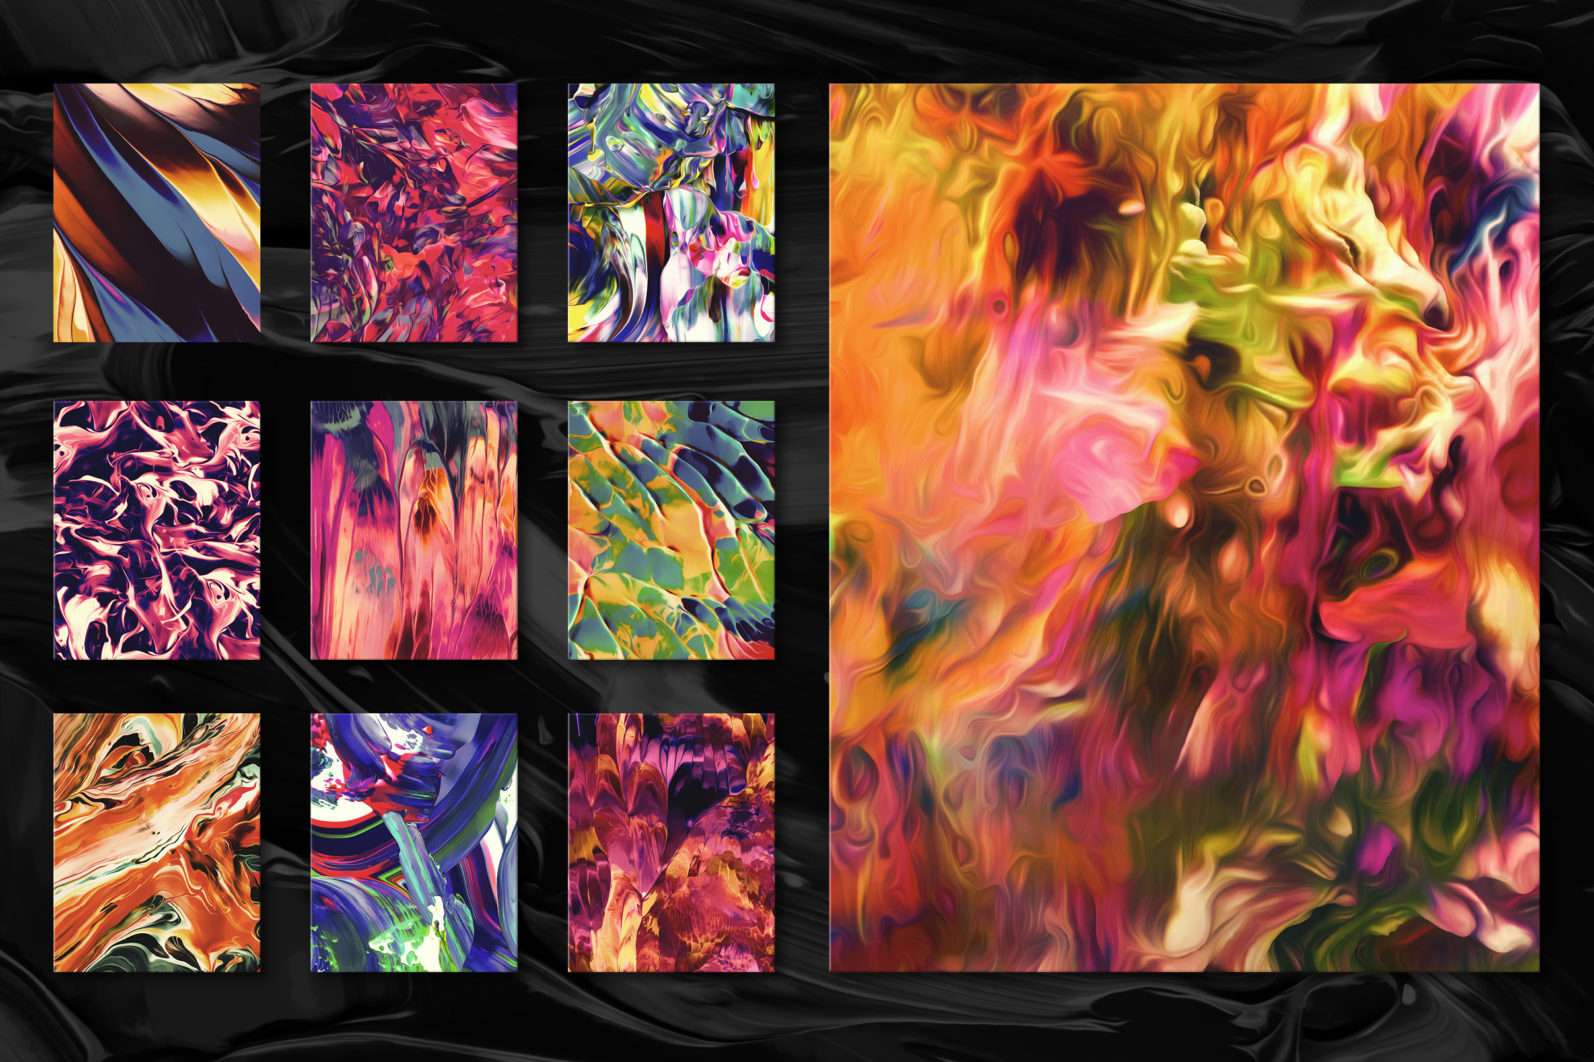 Flow, Vol. 2: 100 Smooth Paint Textures - Flow Vol 2 Preview 13 -